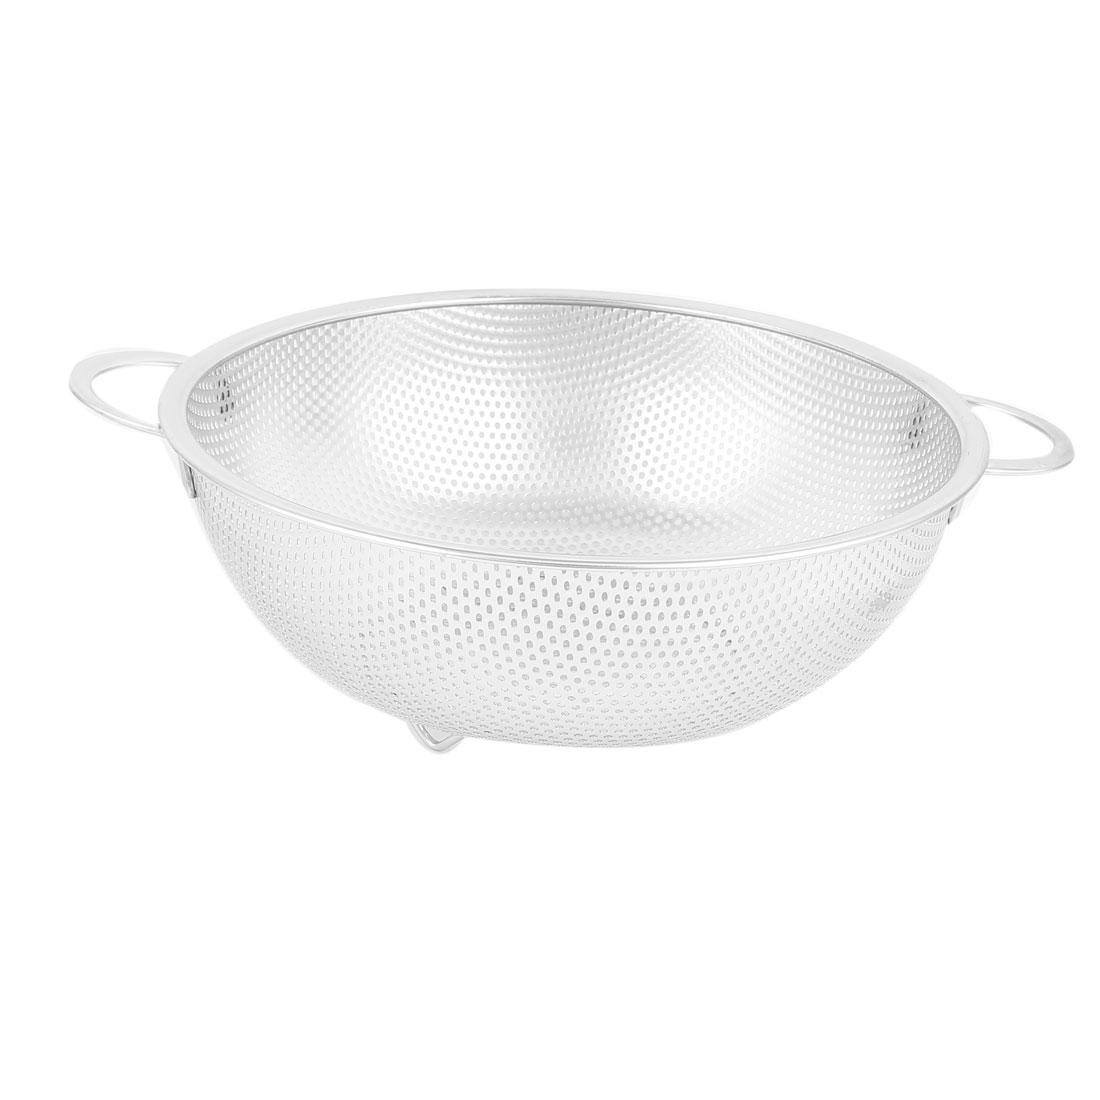 Kitchen Rice Vegetable Wash Metal Mesh Drainer Strainer Basket Colander 28.5cm